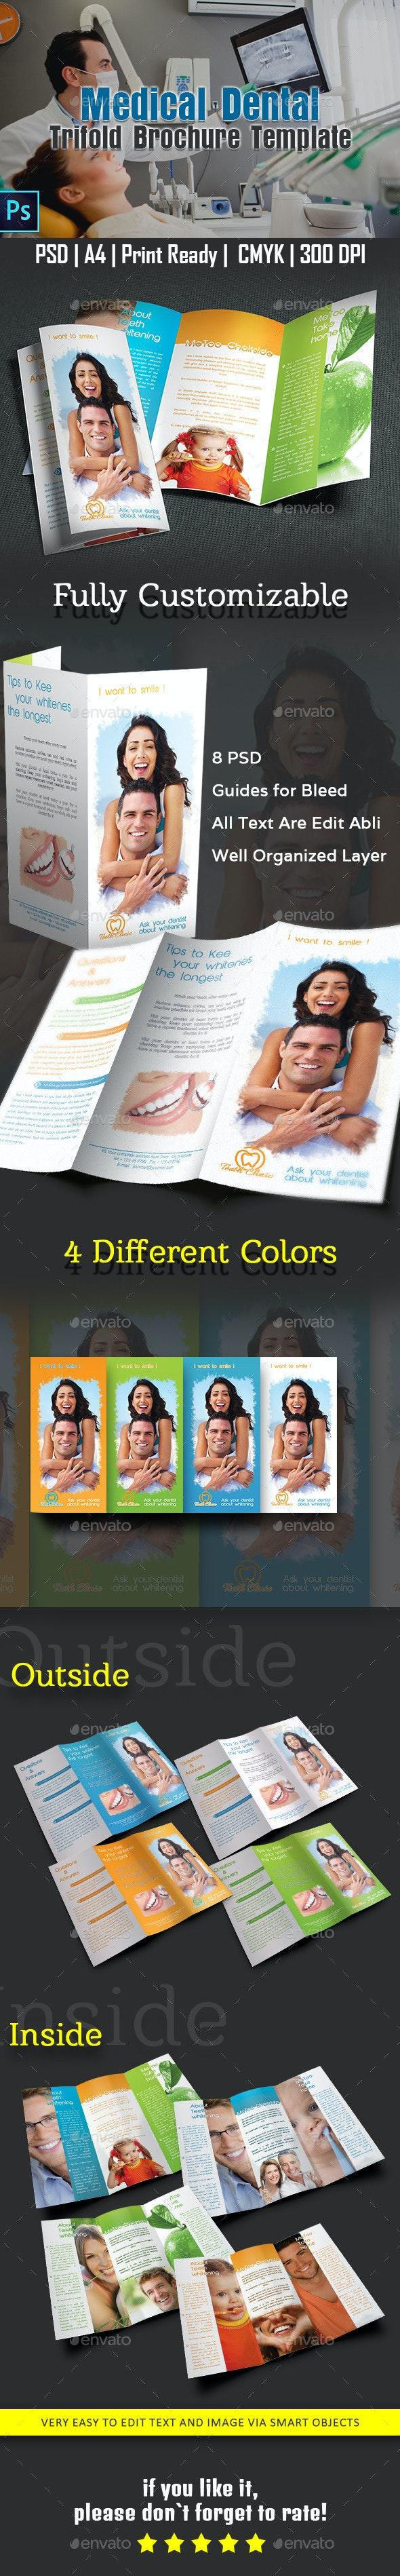 Medical Dental Trifold Brochure Template - Corporate Brochures